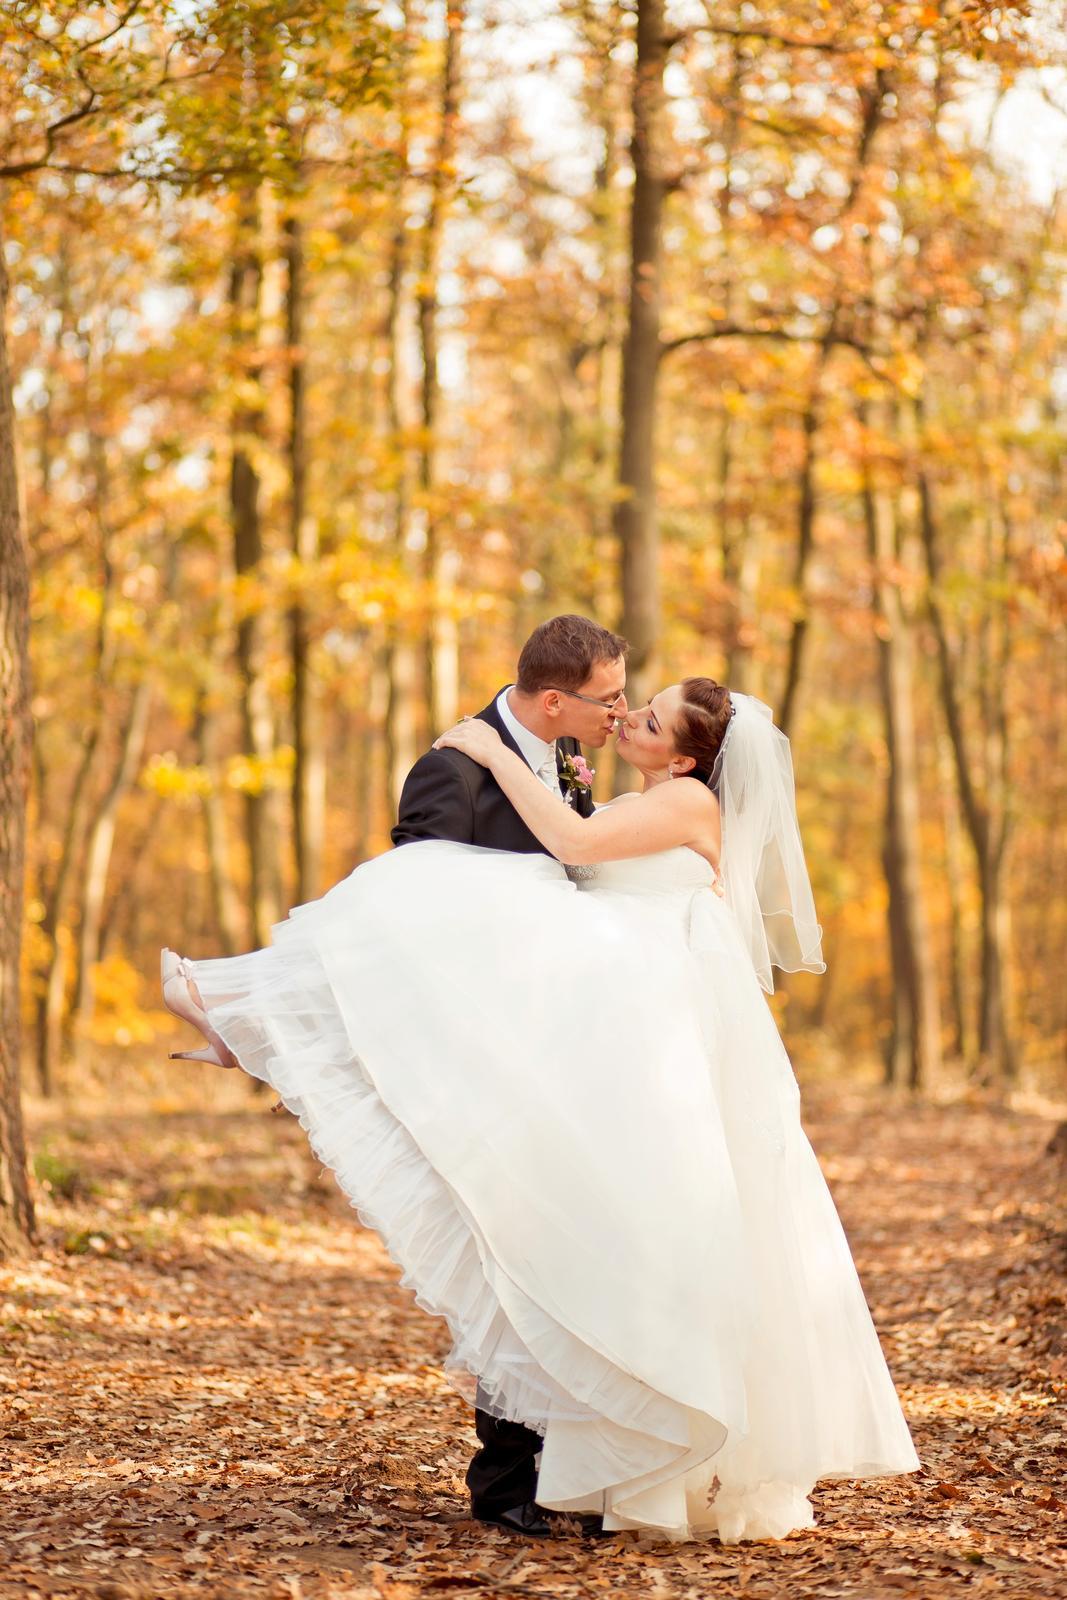 KATKA{{_AND_}} PEŤO Októbrová romanca - A na rukach celý zivot